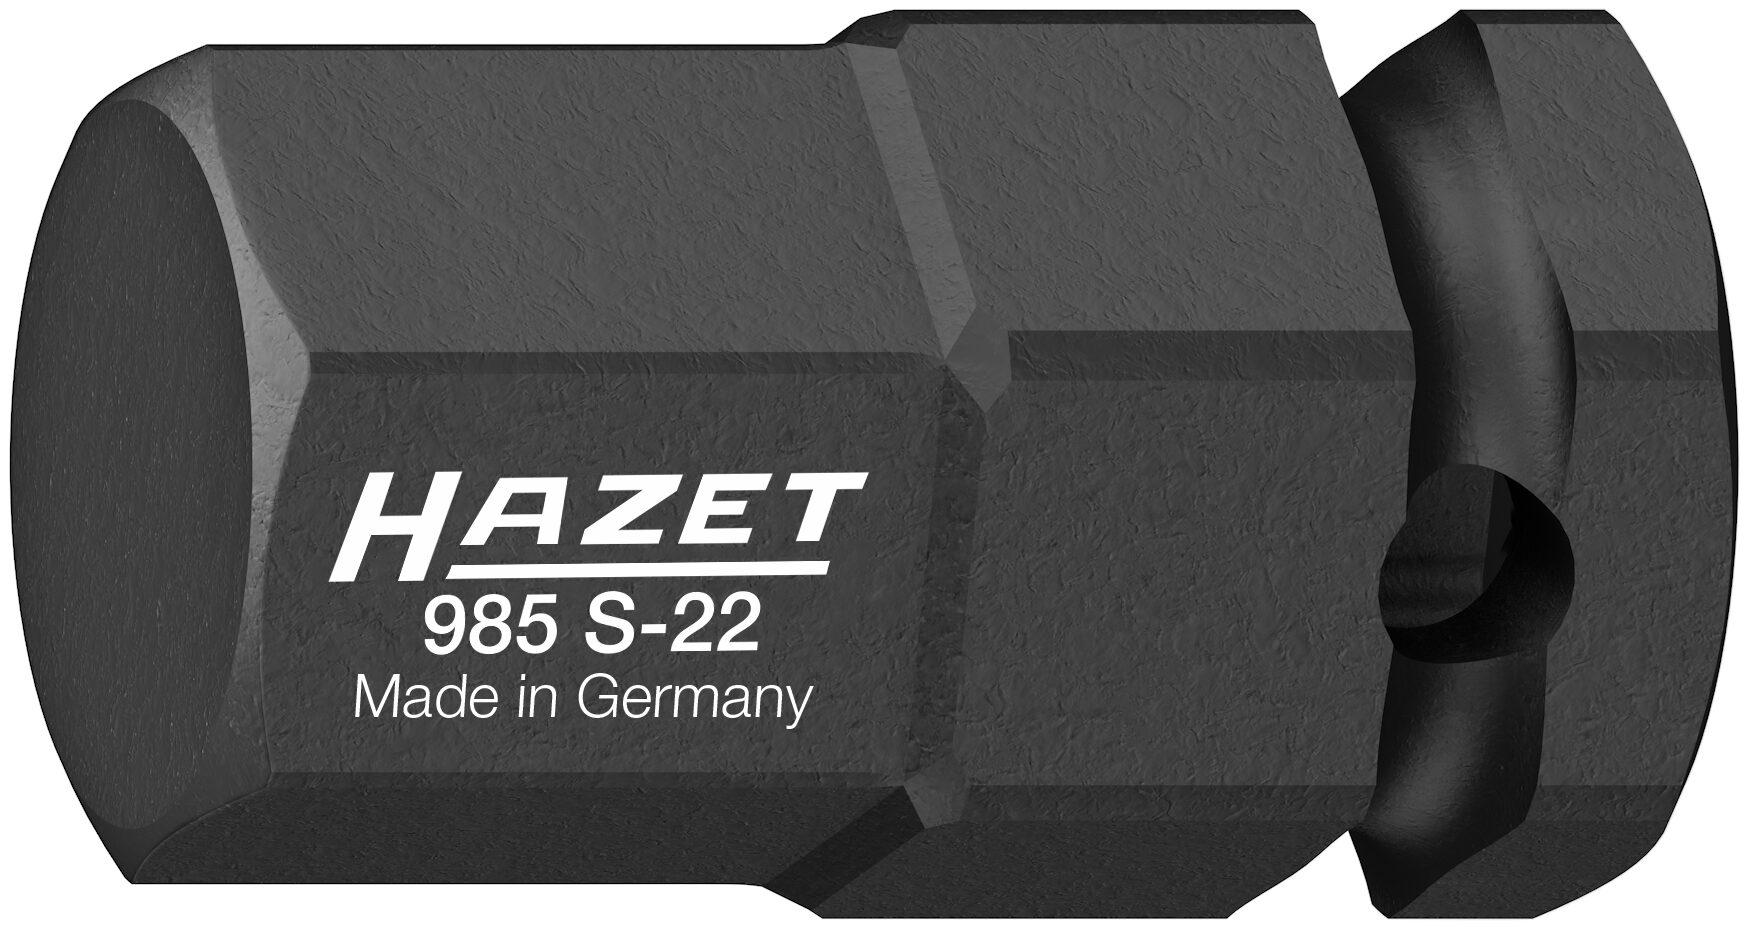 HAZET Schlag- ∙ Maschinenschrauber Schraubendreher-Steckschlüsseleinsatz 985S-22 ∙ Vierkant hohl 12,5 mm (1/2 Zoll)